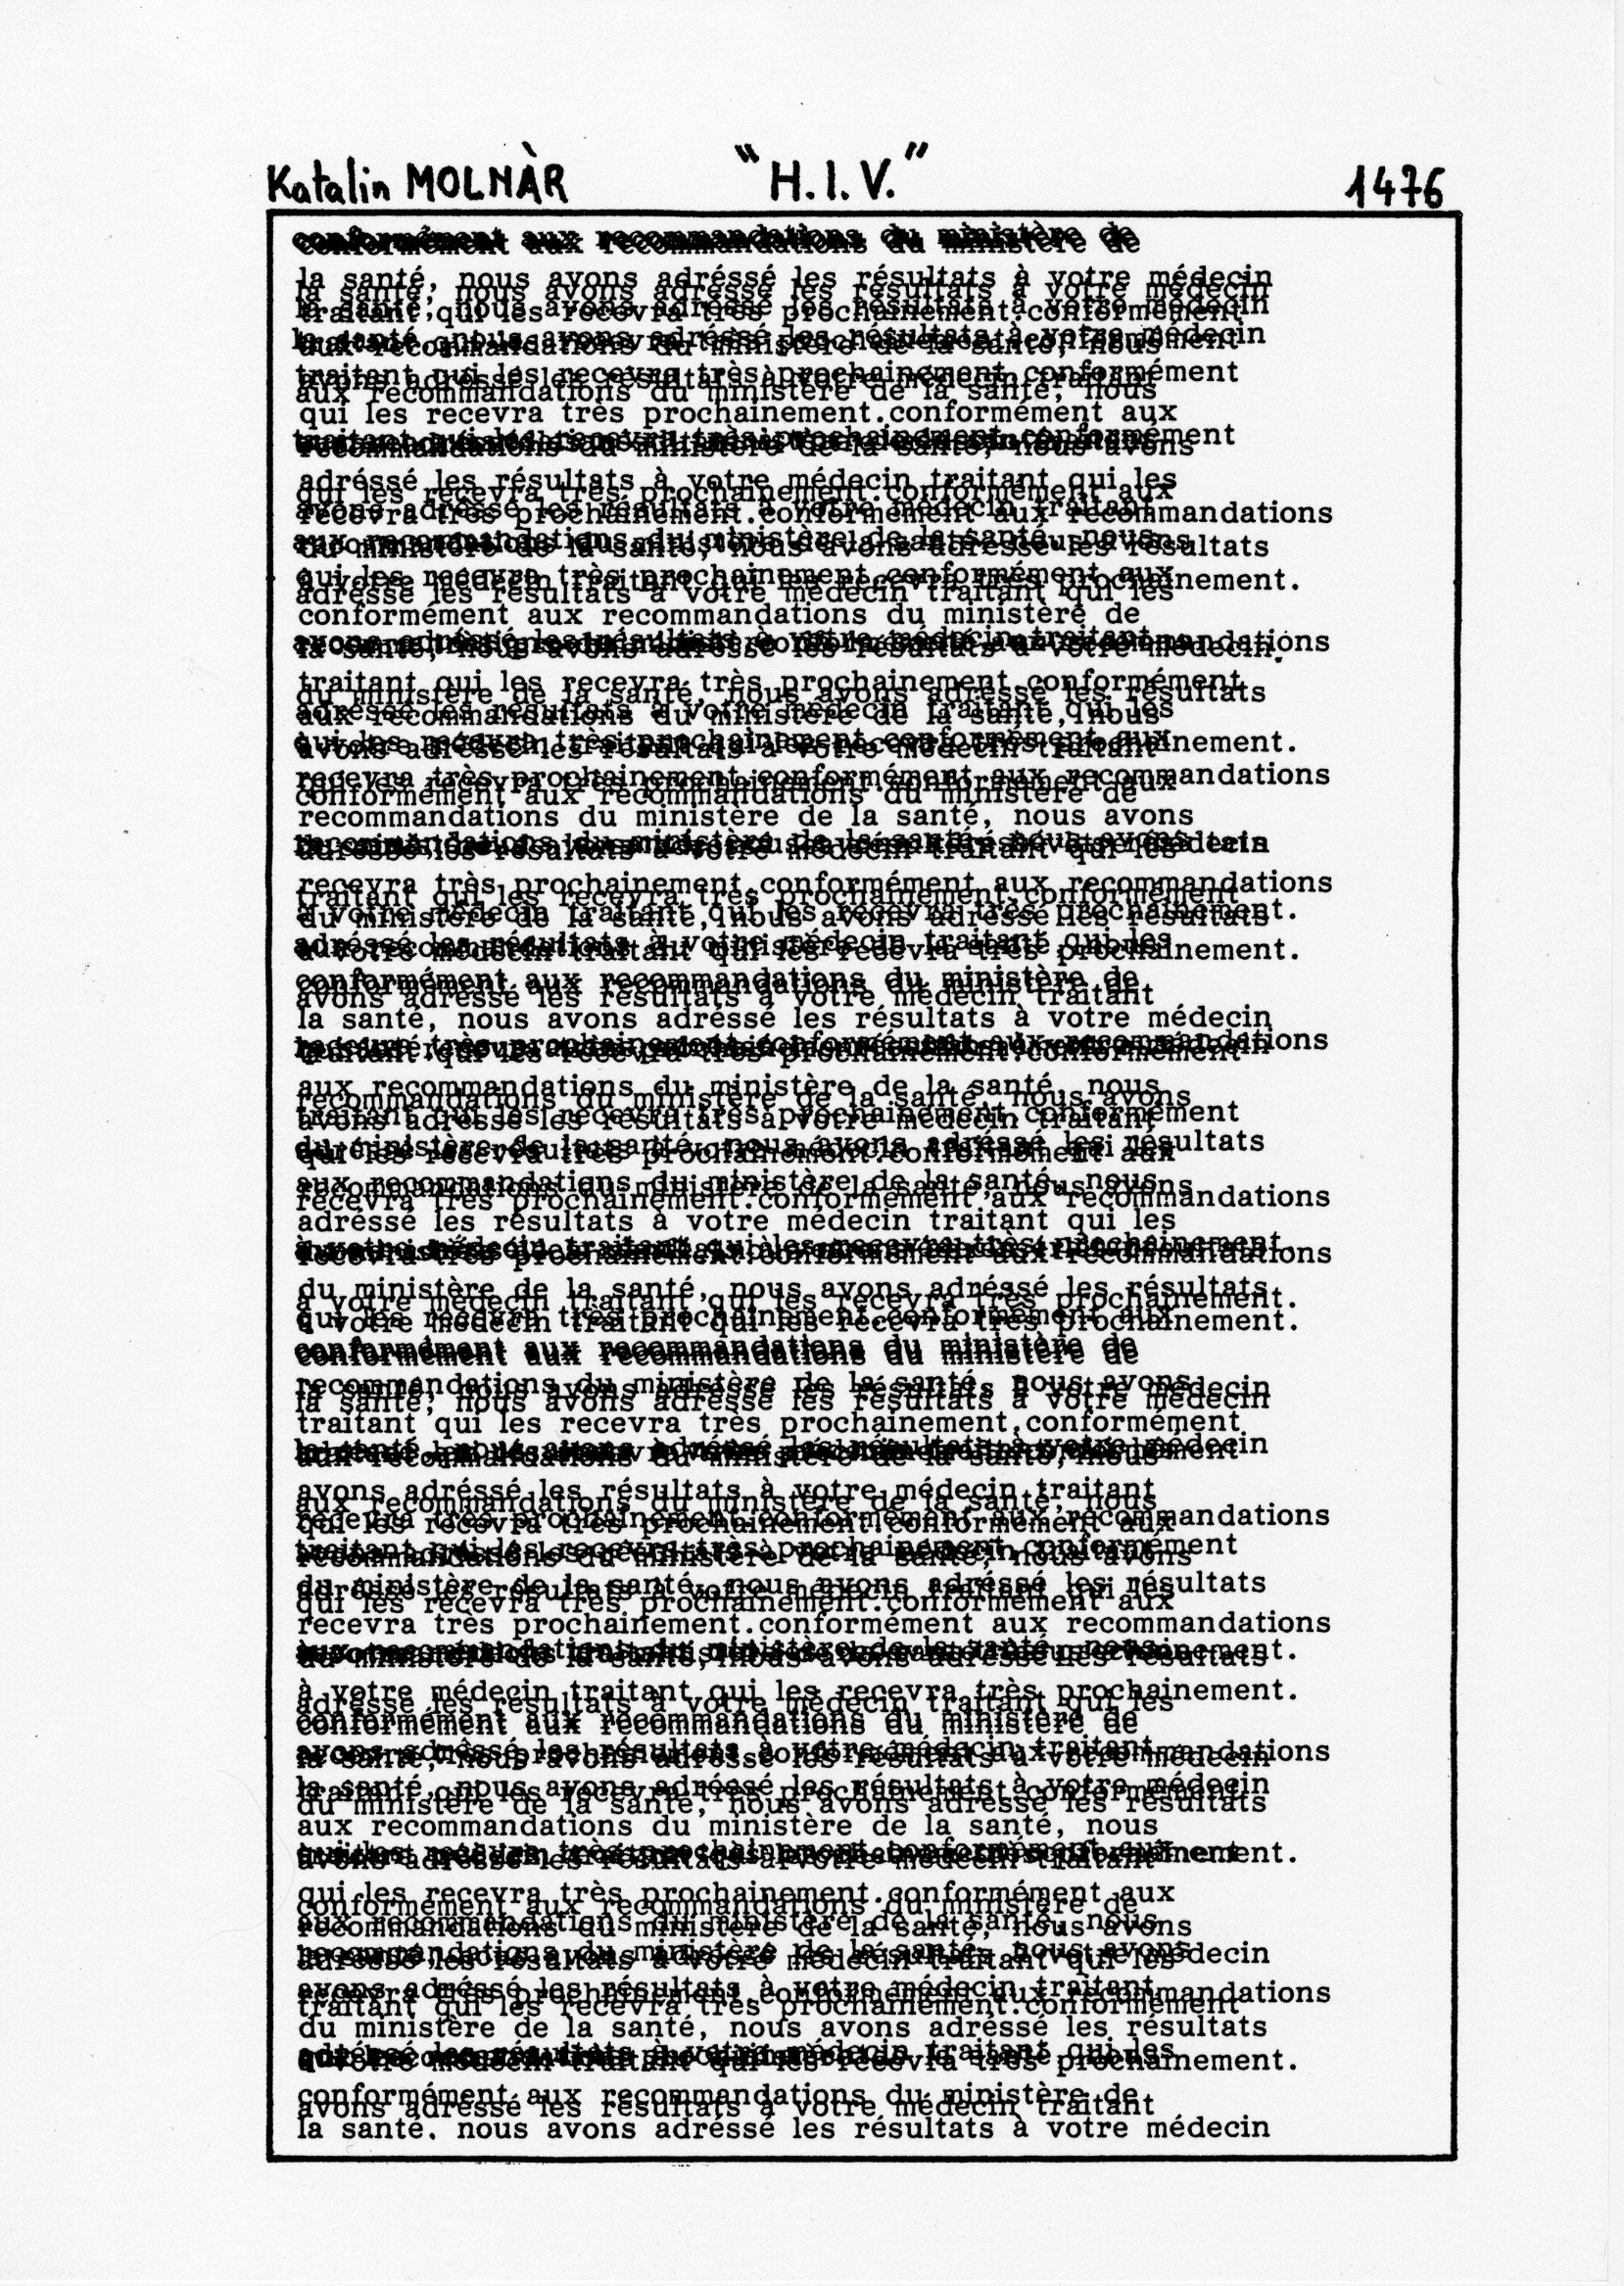 page 1476 K. Molnar H.I.V.